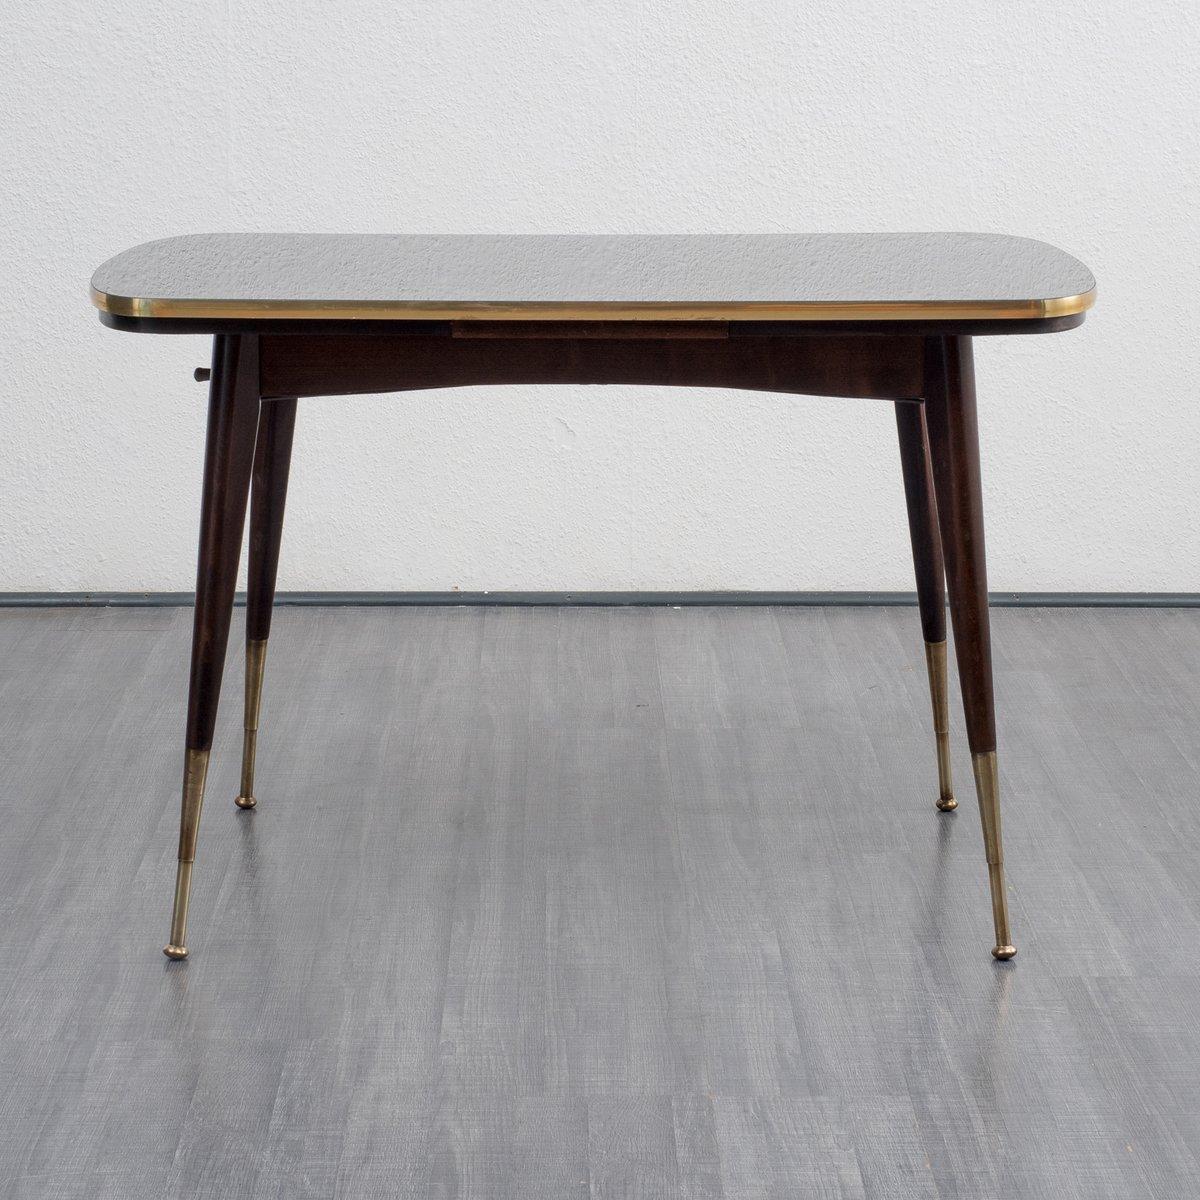 einzigartig table basse hauteur r glable id es de. Black Bedroom Furniture Sets. Home Design Ideas